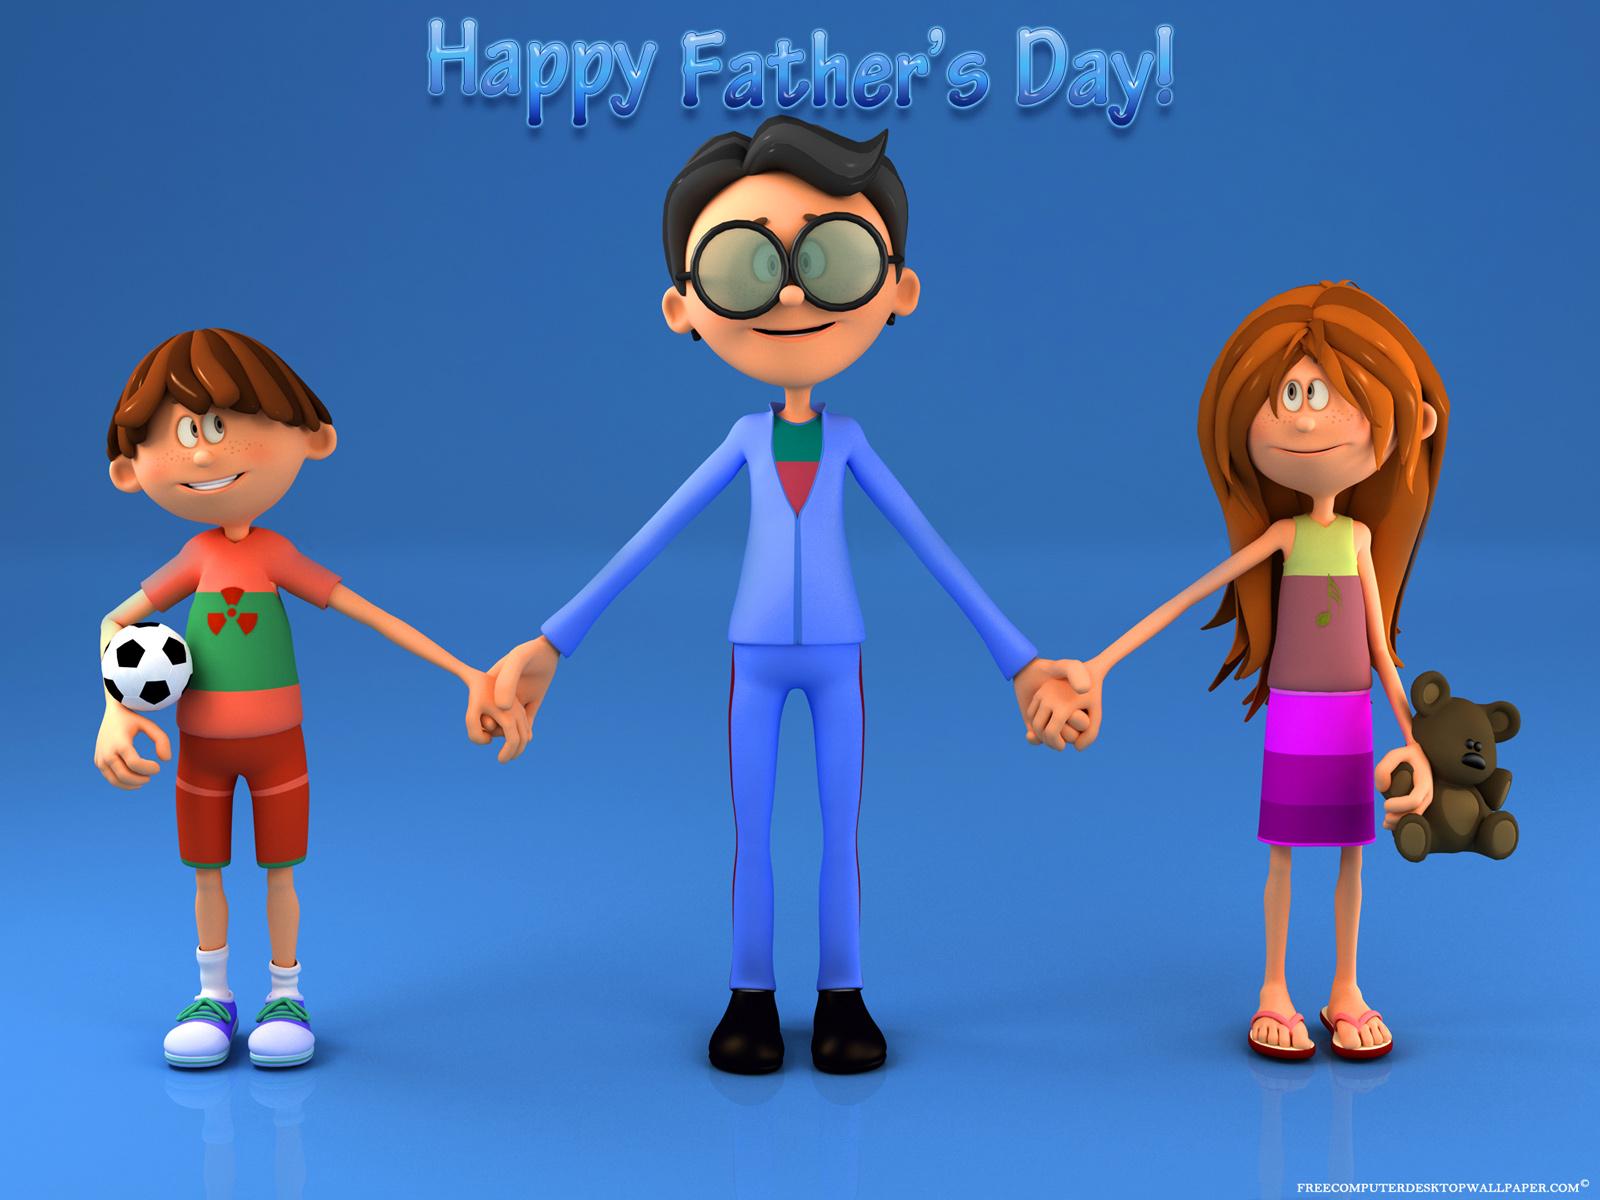 http://3.bp.blogspot.com/-rJ3PtonqRww/T8DPqdn28oI/AAAAAAAADl8/_6jZ2NHRuao/s1600/Happy-Fathers-Day-Dad-Desktop-Wallpaper.jpg